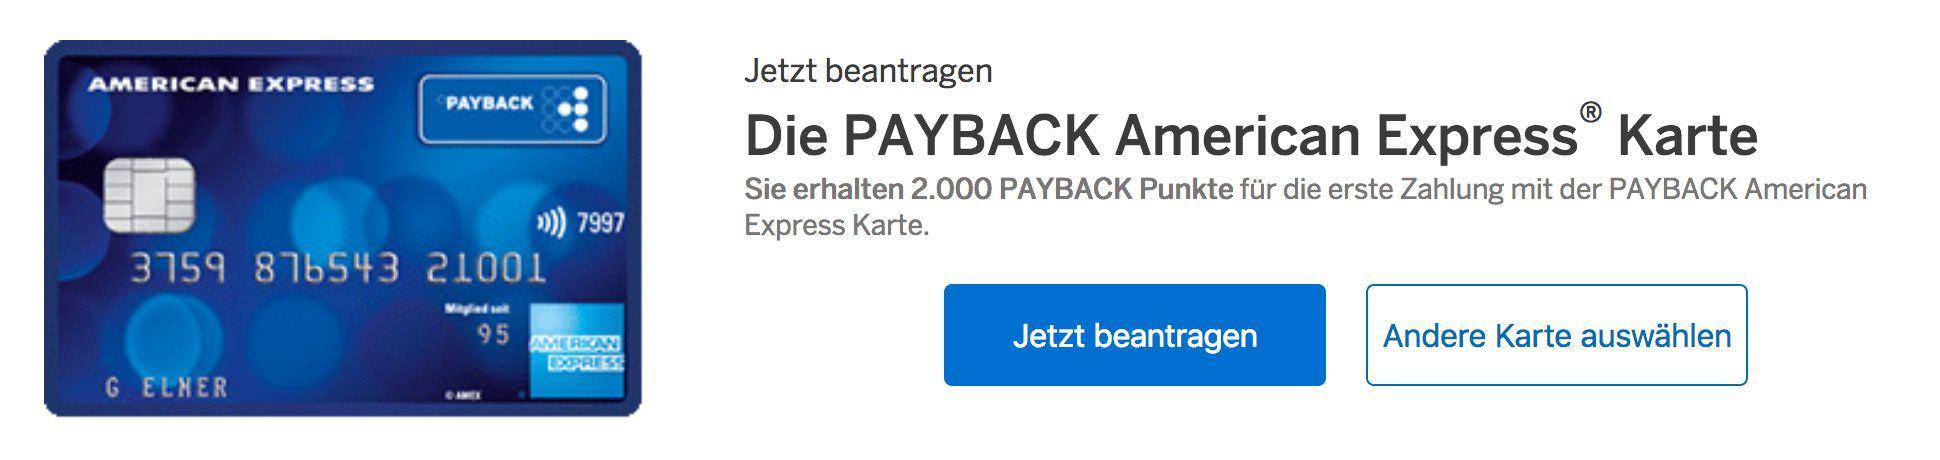 Payback Karte Beantragen.Payback Karte Payback Karte With Payback Karte Latest With Payback